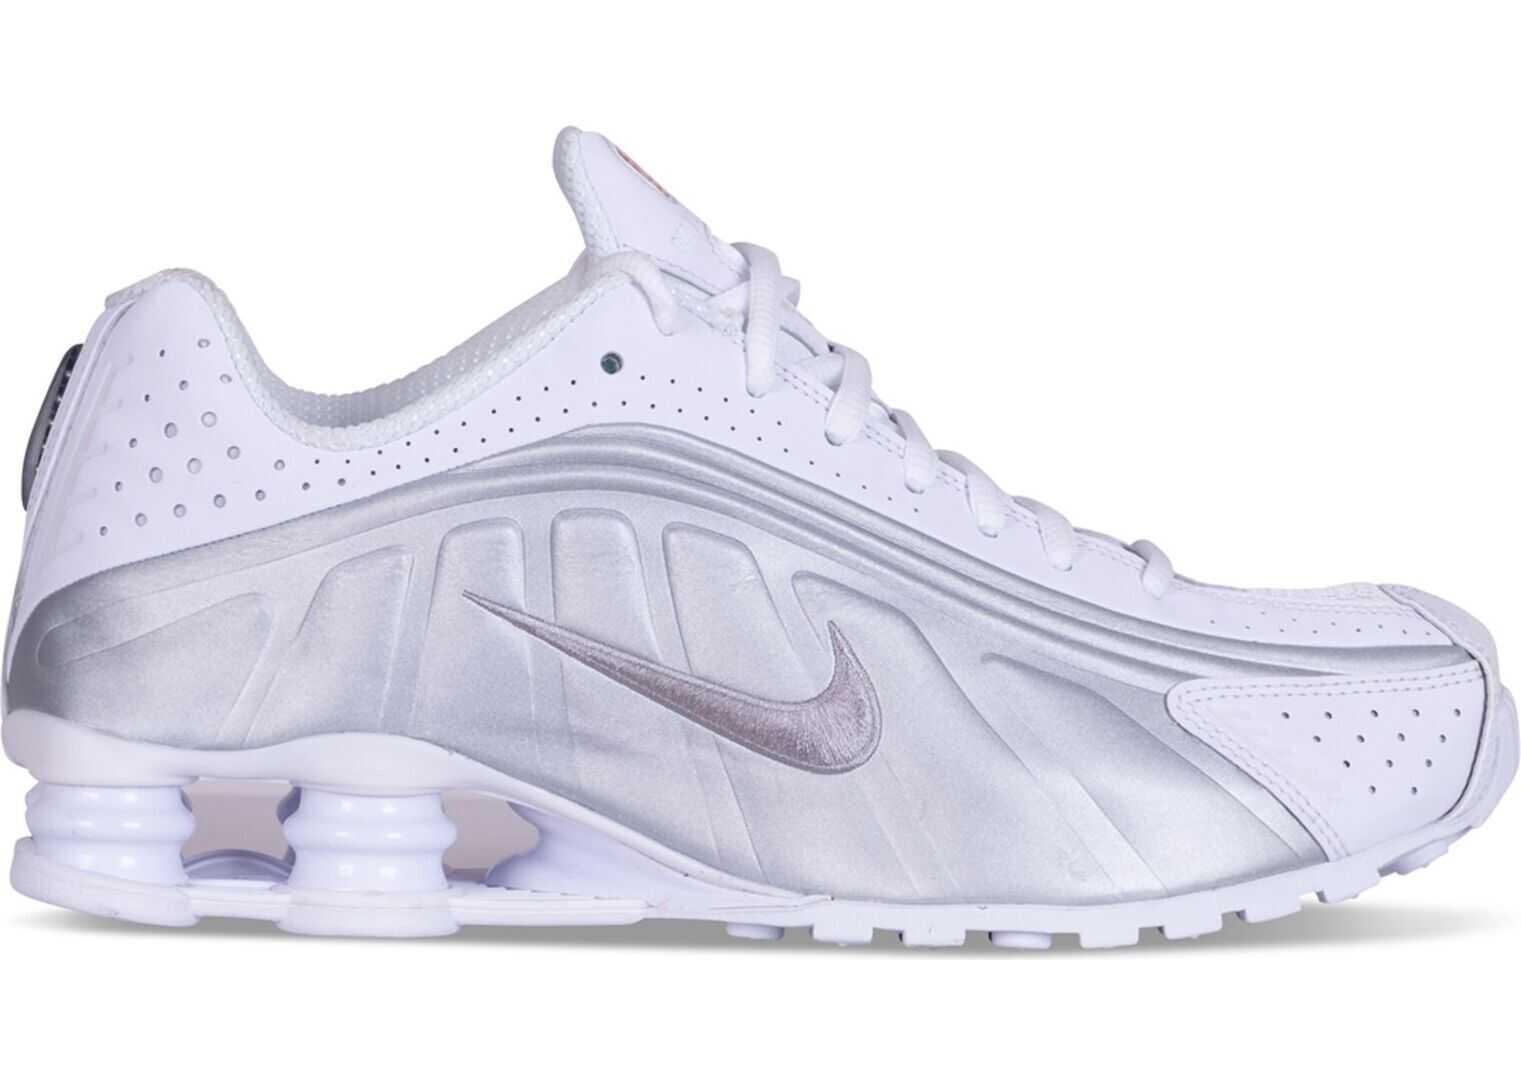 Nike NIKE SHOX R4 WHITE